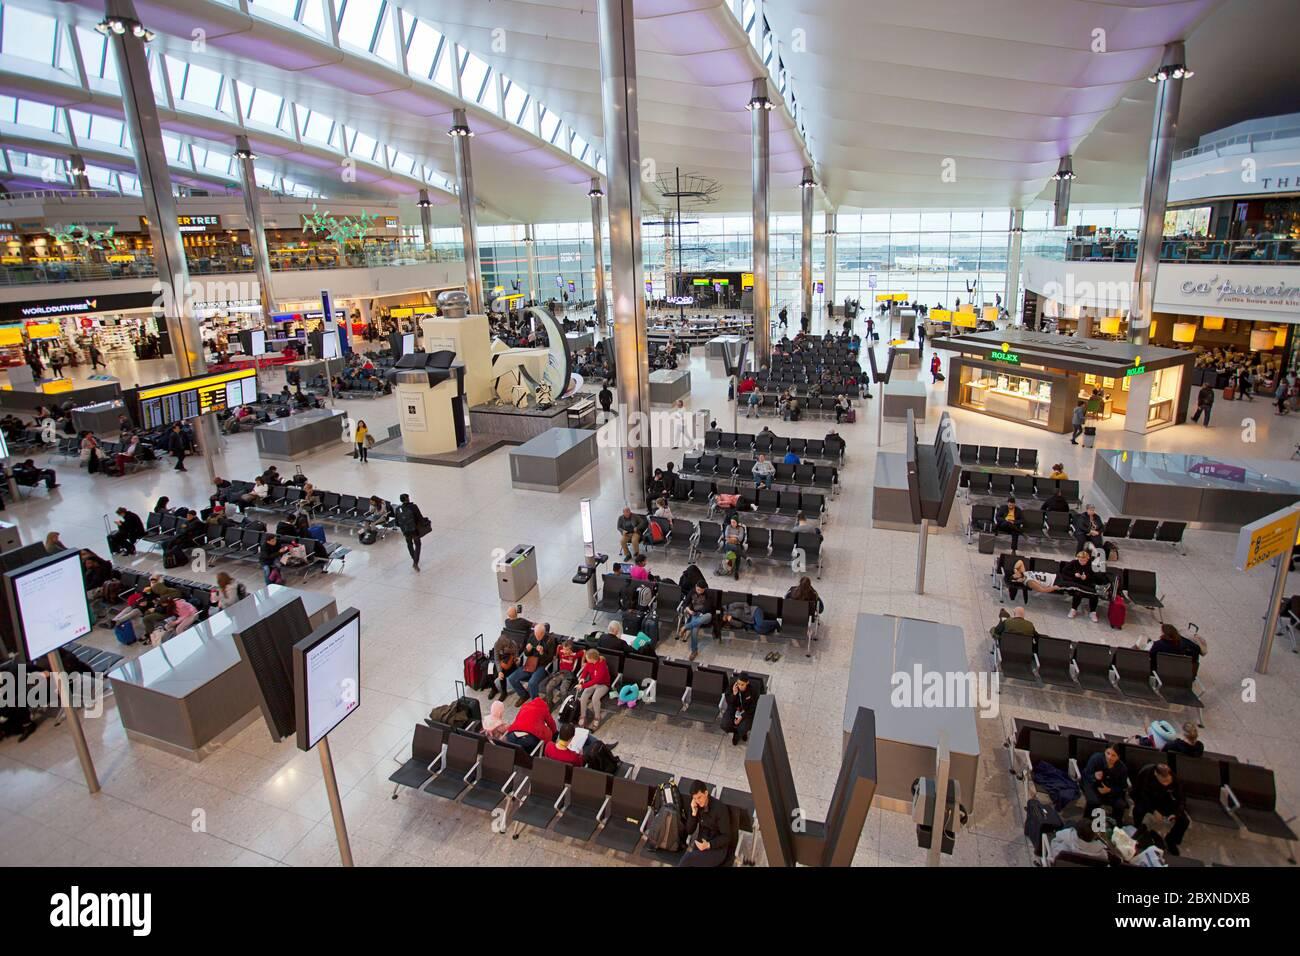 Inside London Heathrow Airport departures terminal, London, UK Stock Photo